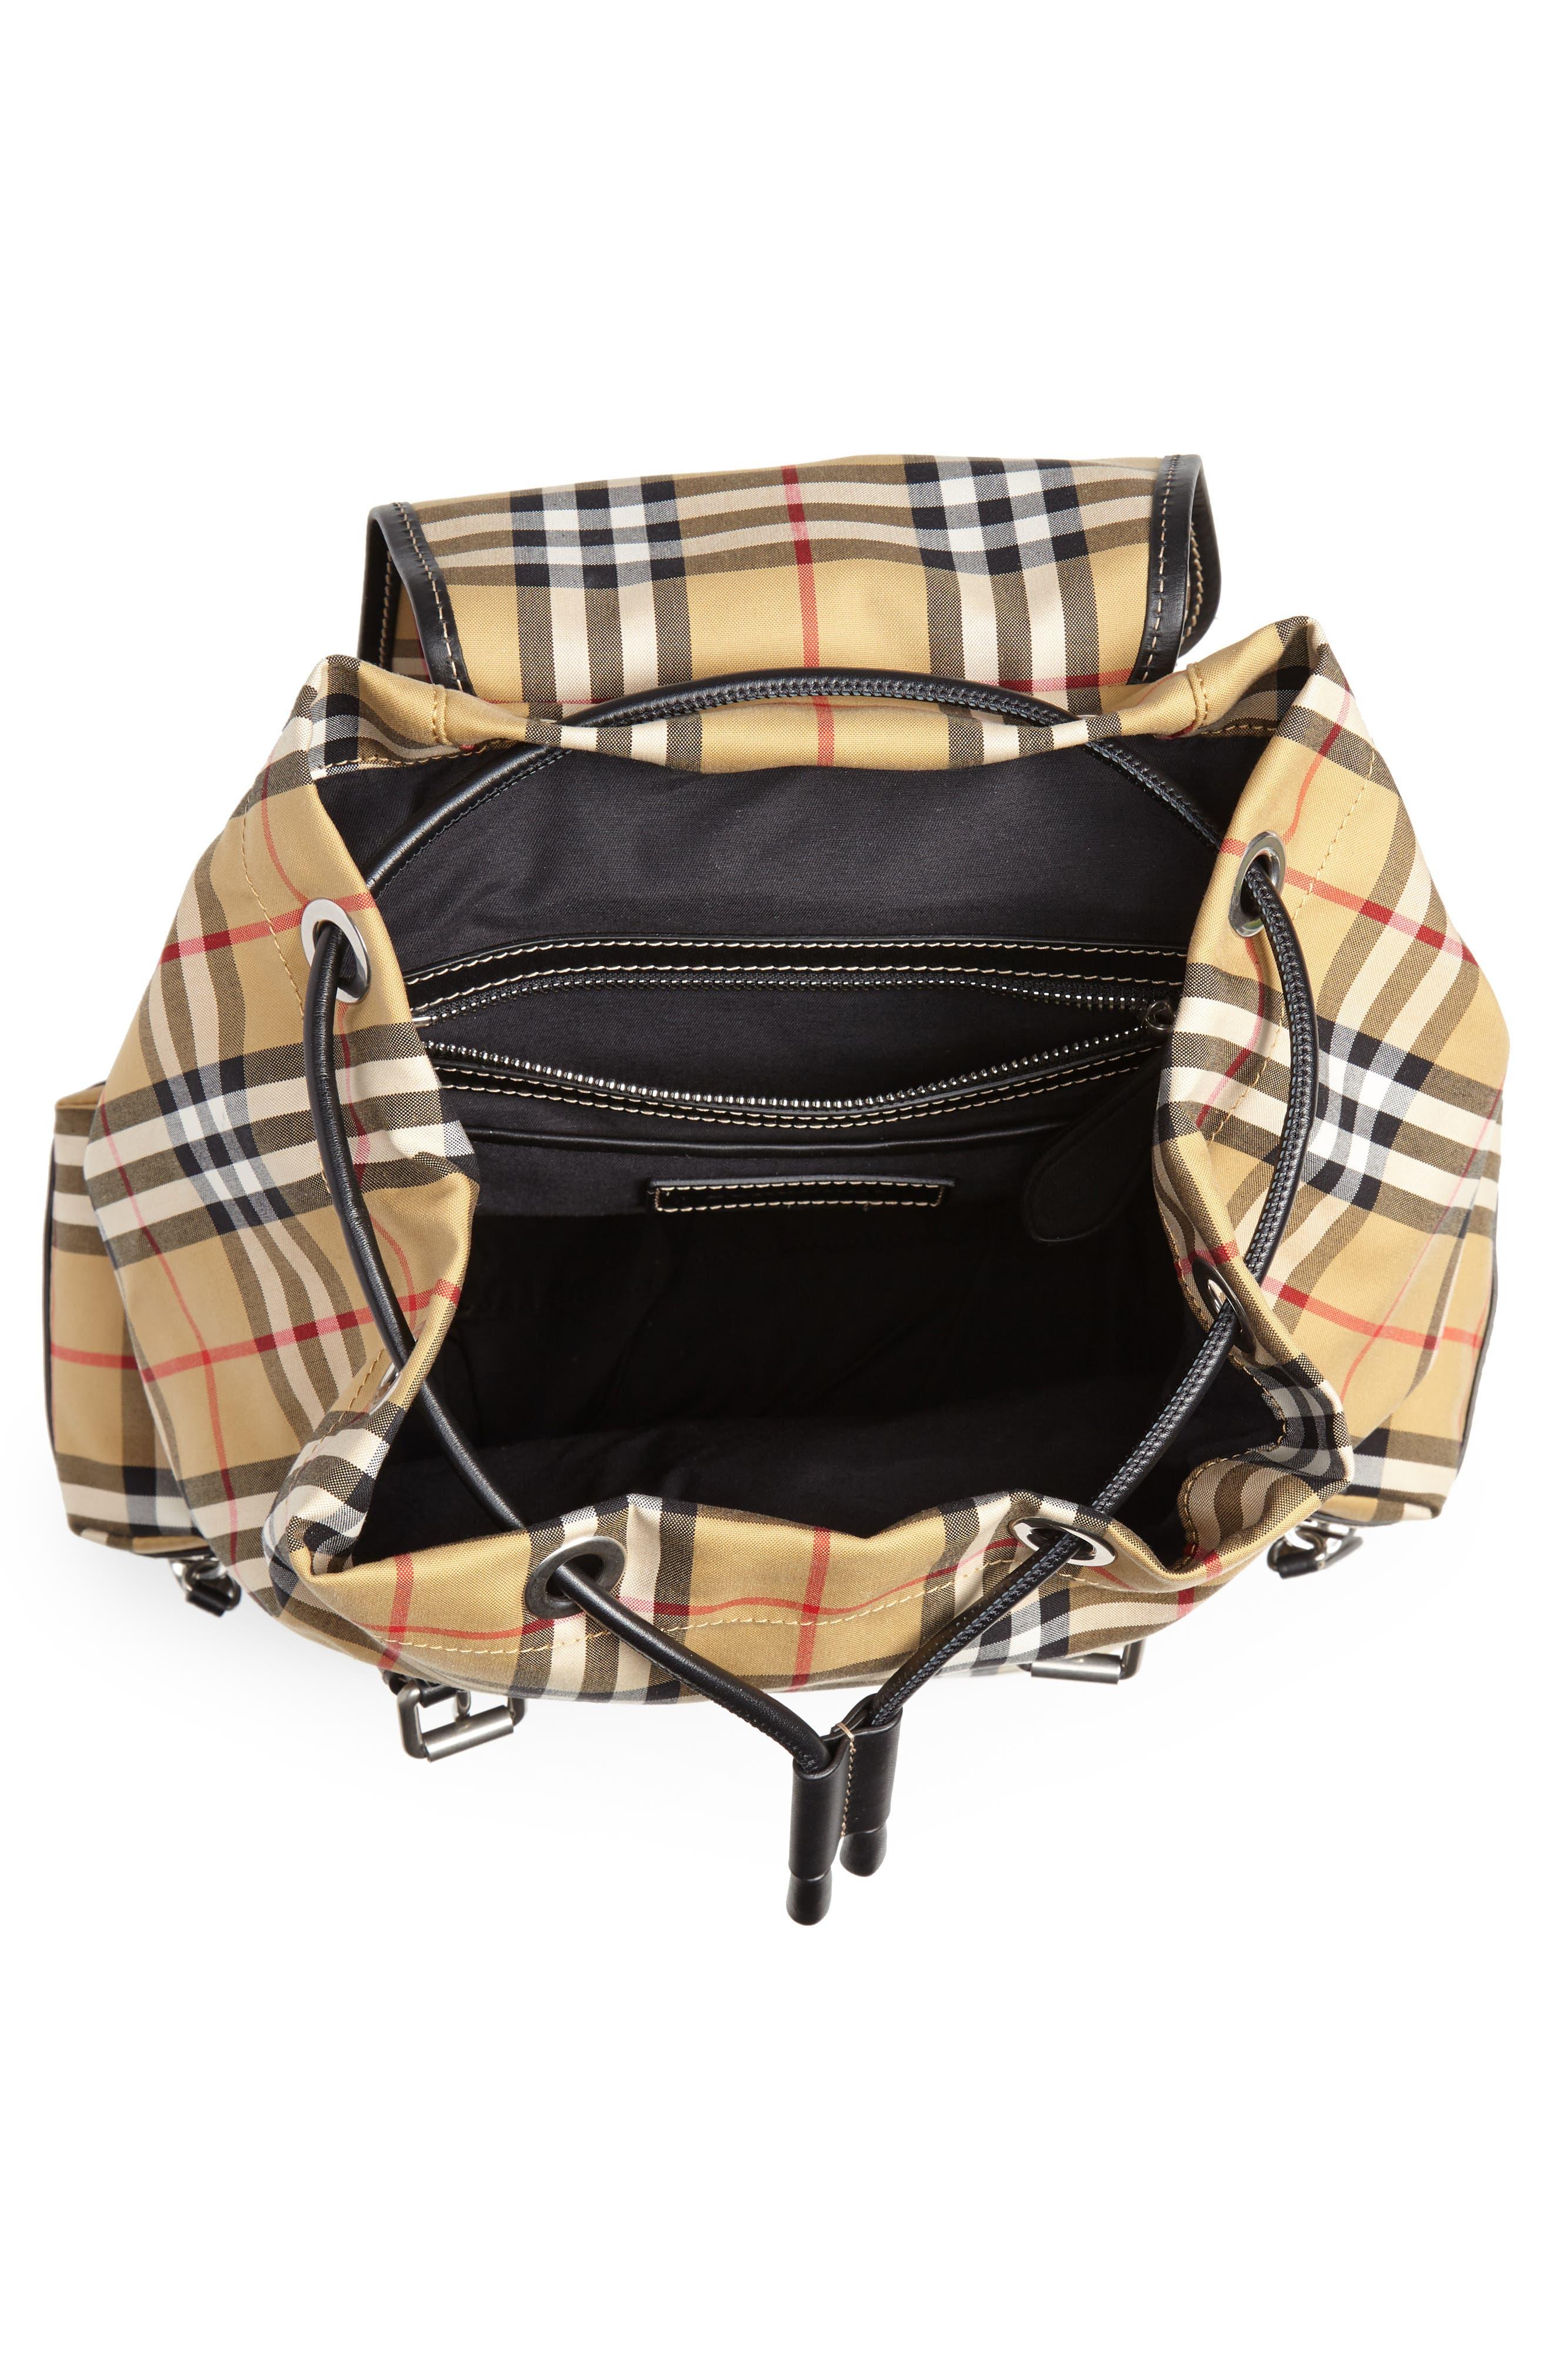 Medium Rucksack Check Cotton Backpack,                             Alternate thumbnail 4, color,                             ANTIQUE YELLOW